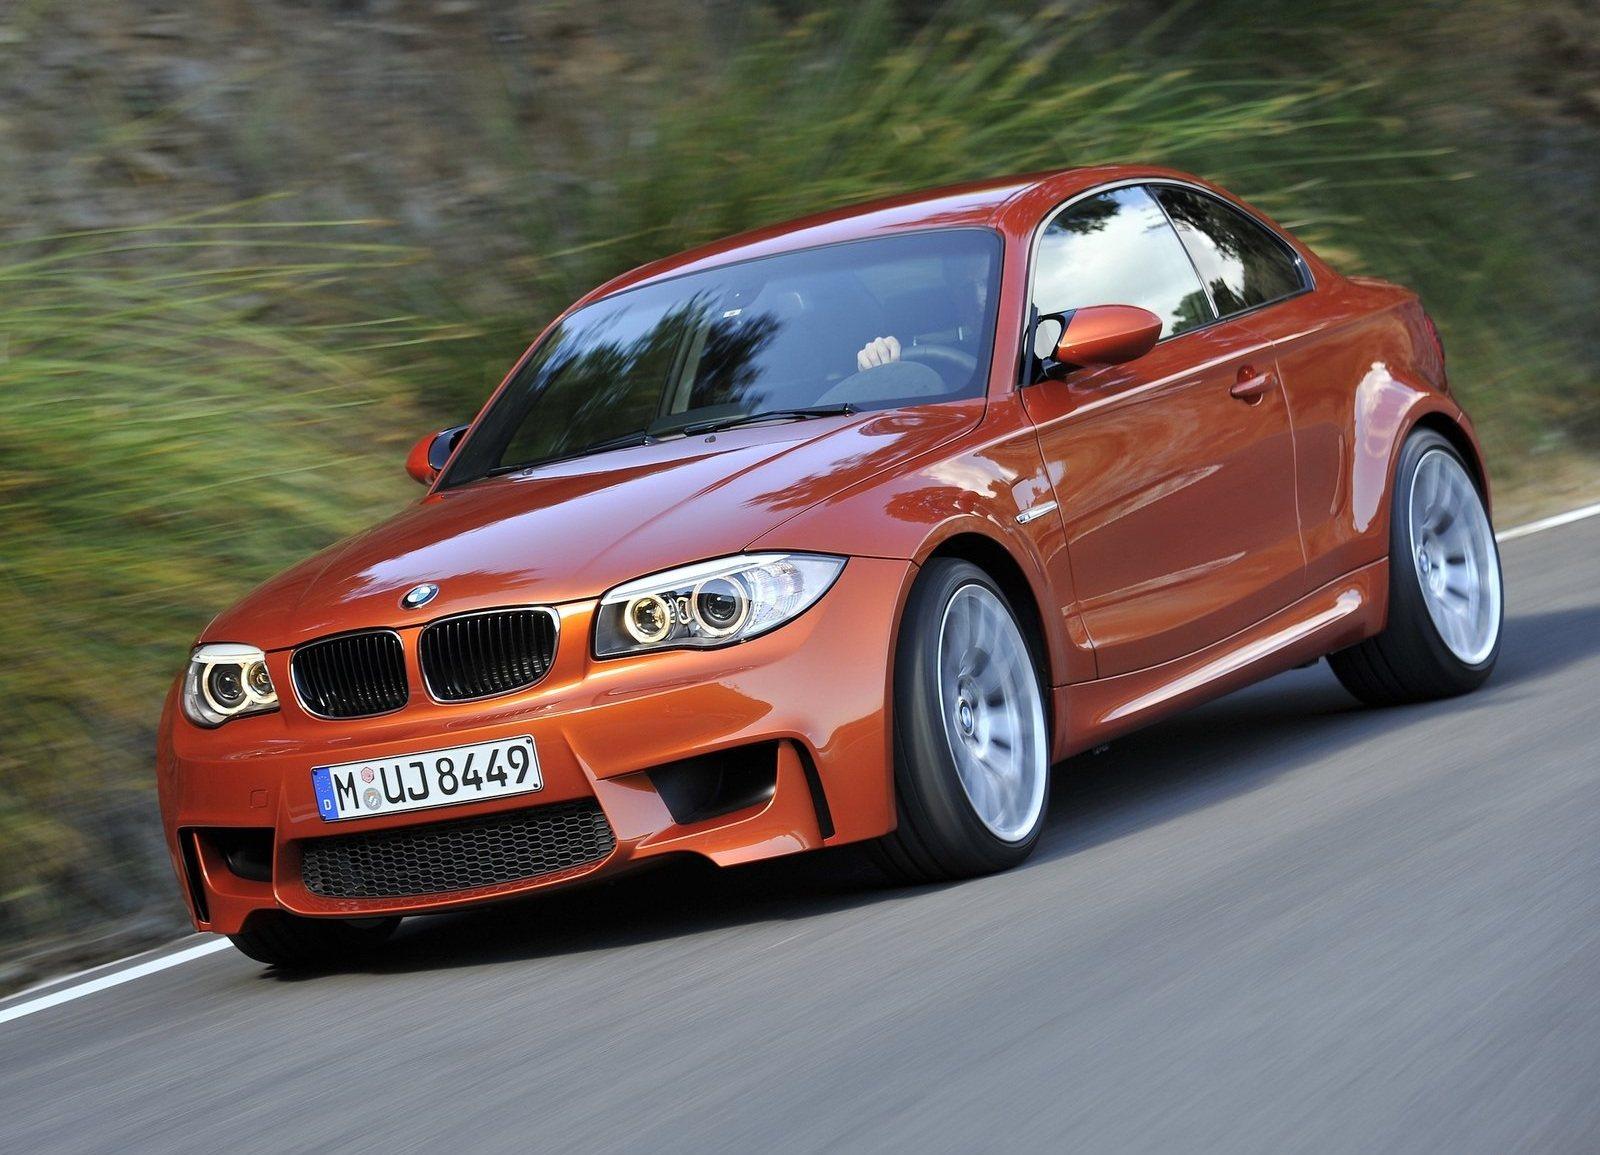 BMW-1-Series_M_Coupe_2011_1600x1200_wallpaper_02